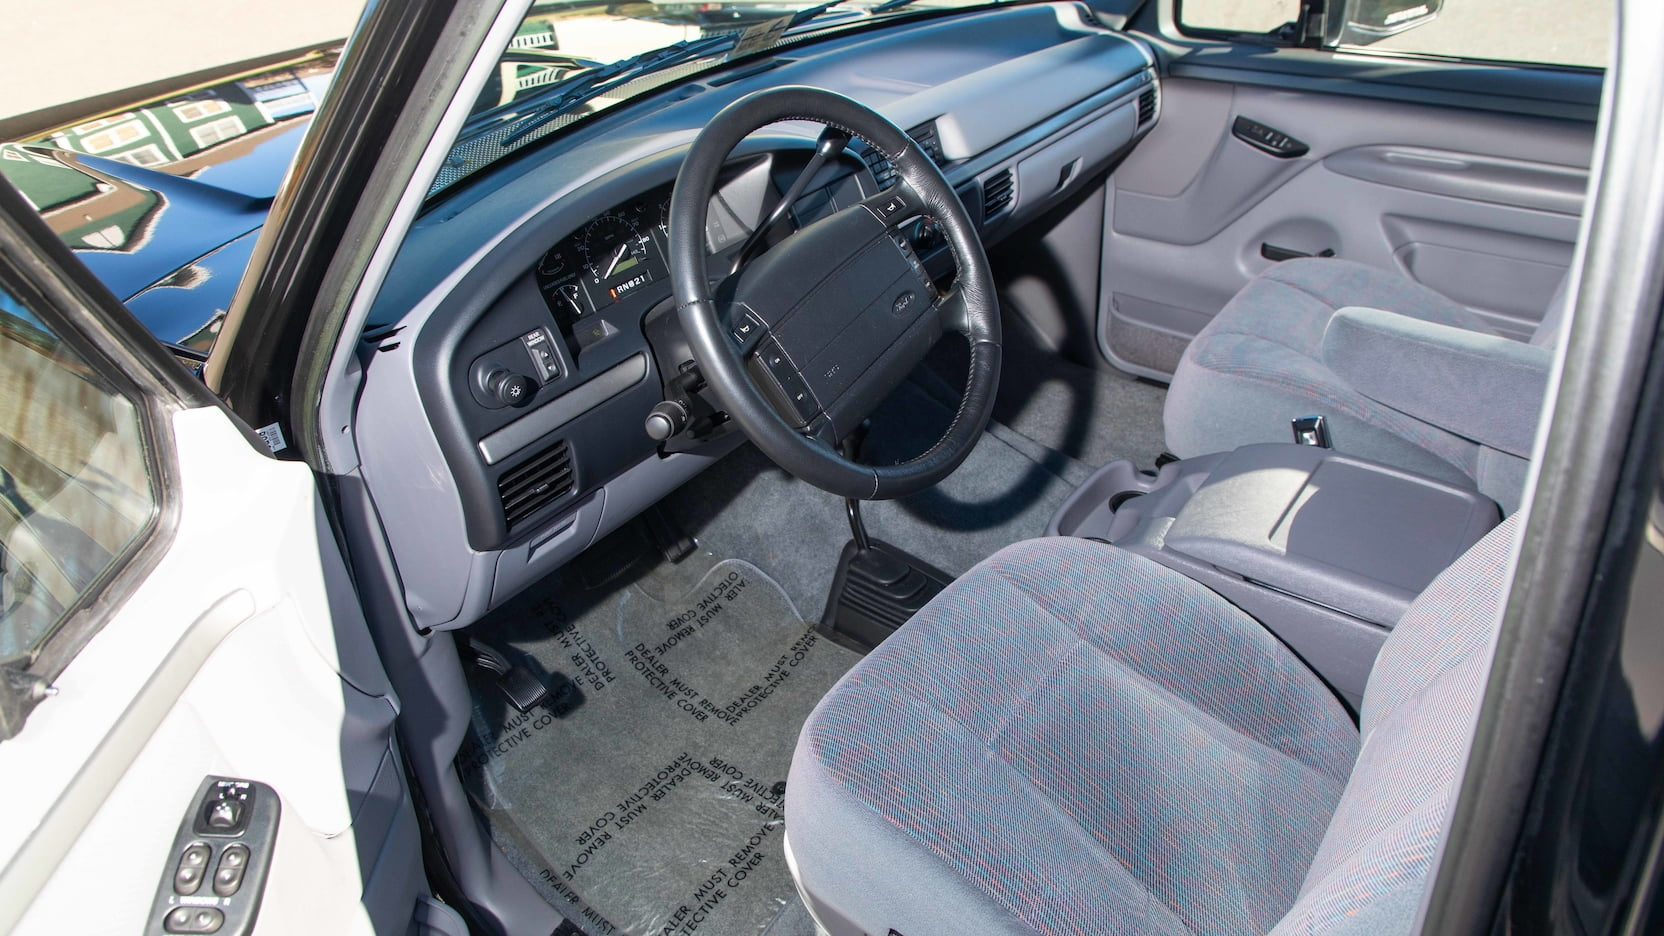 1995 Ford Bronco XLT Interior